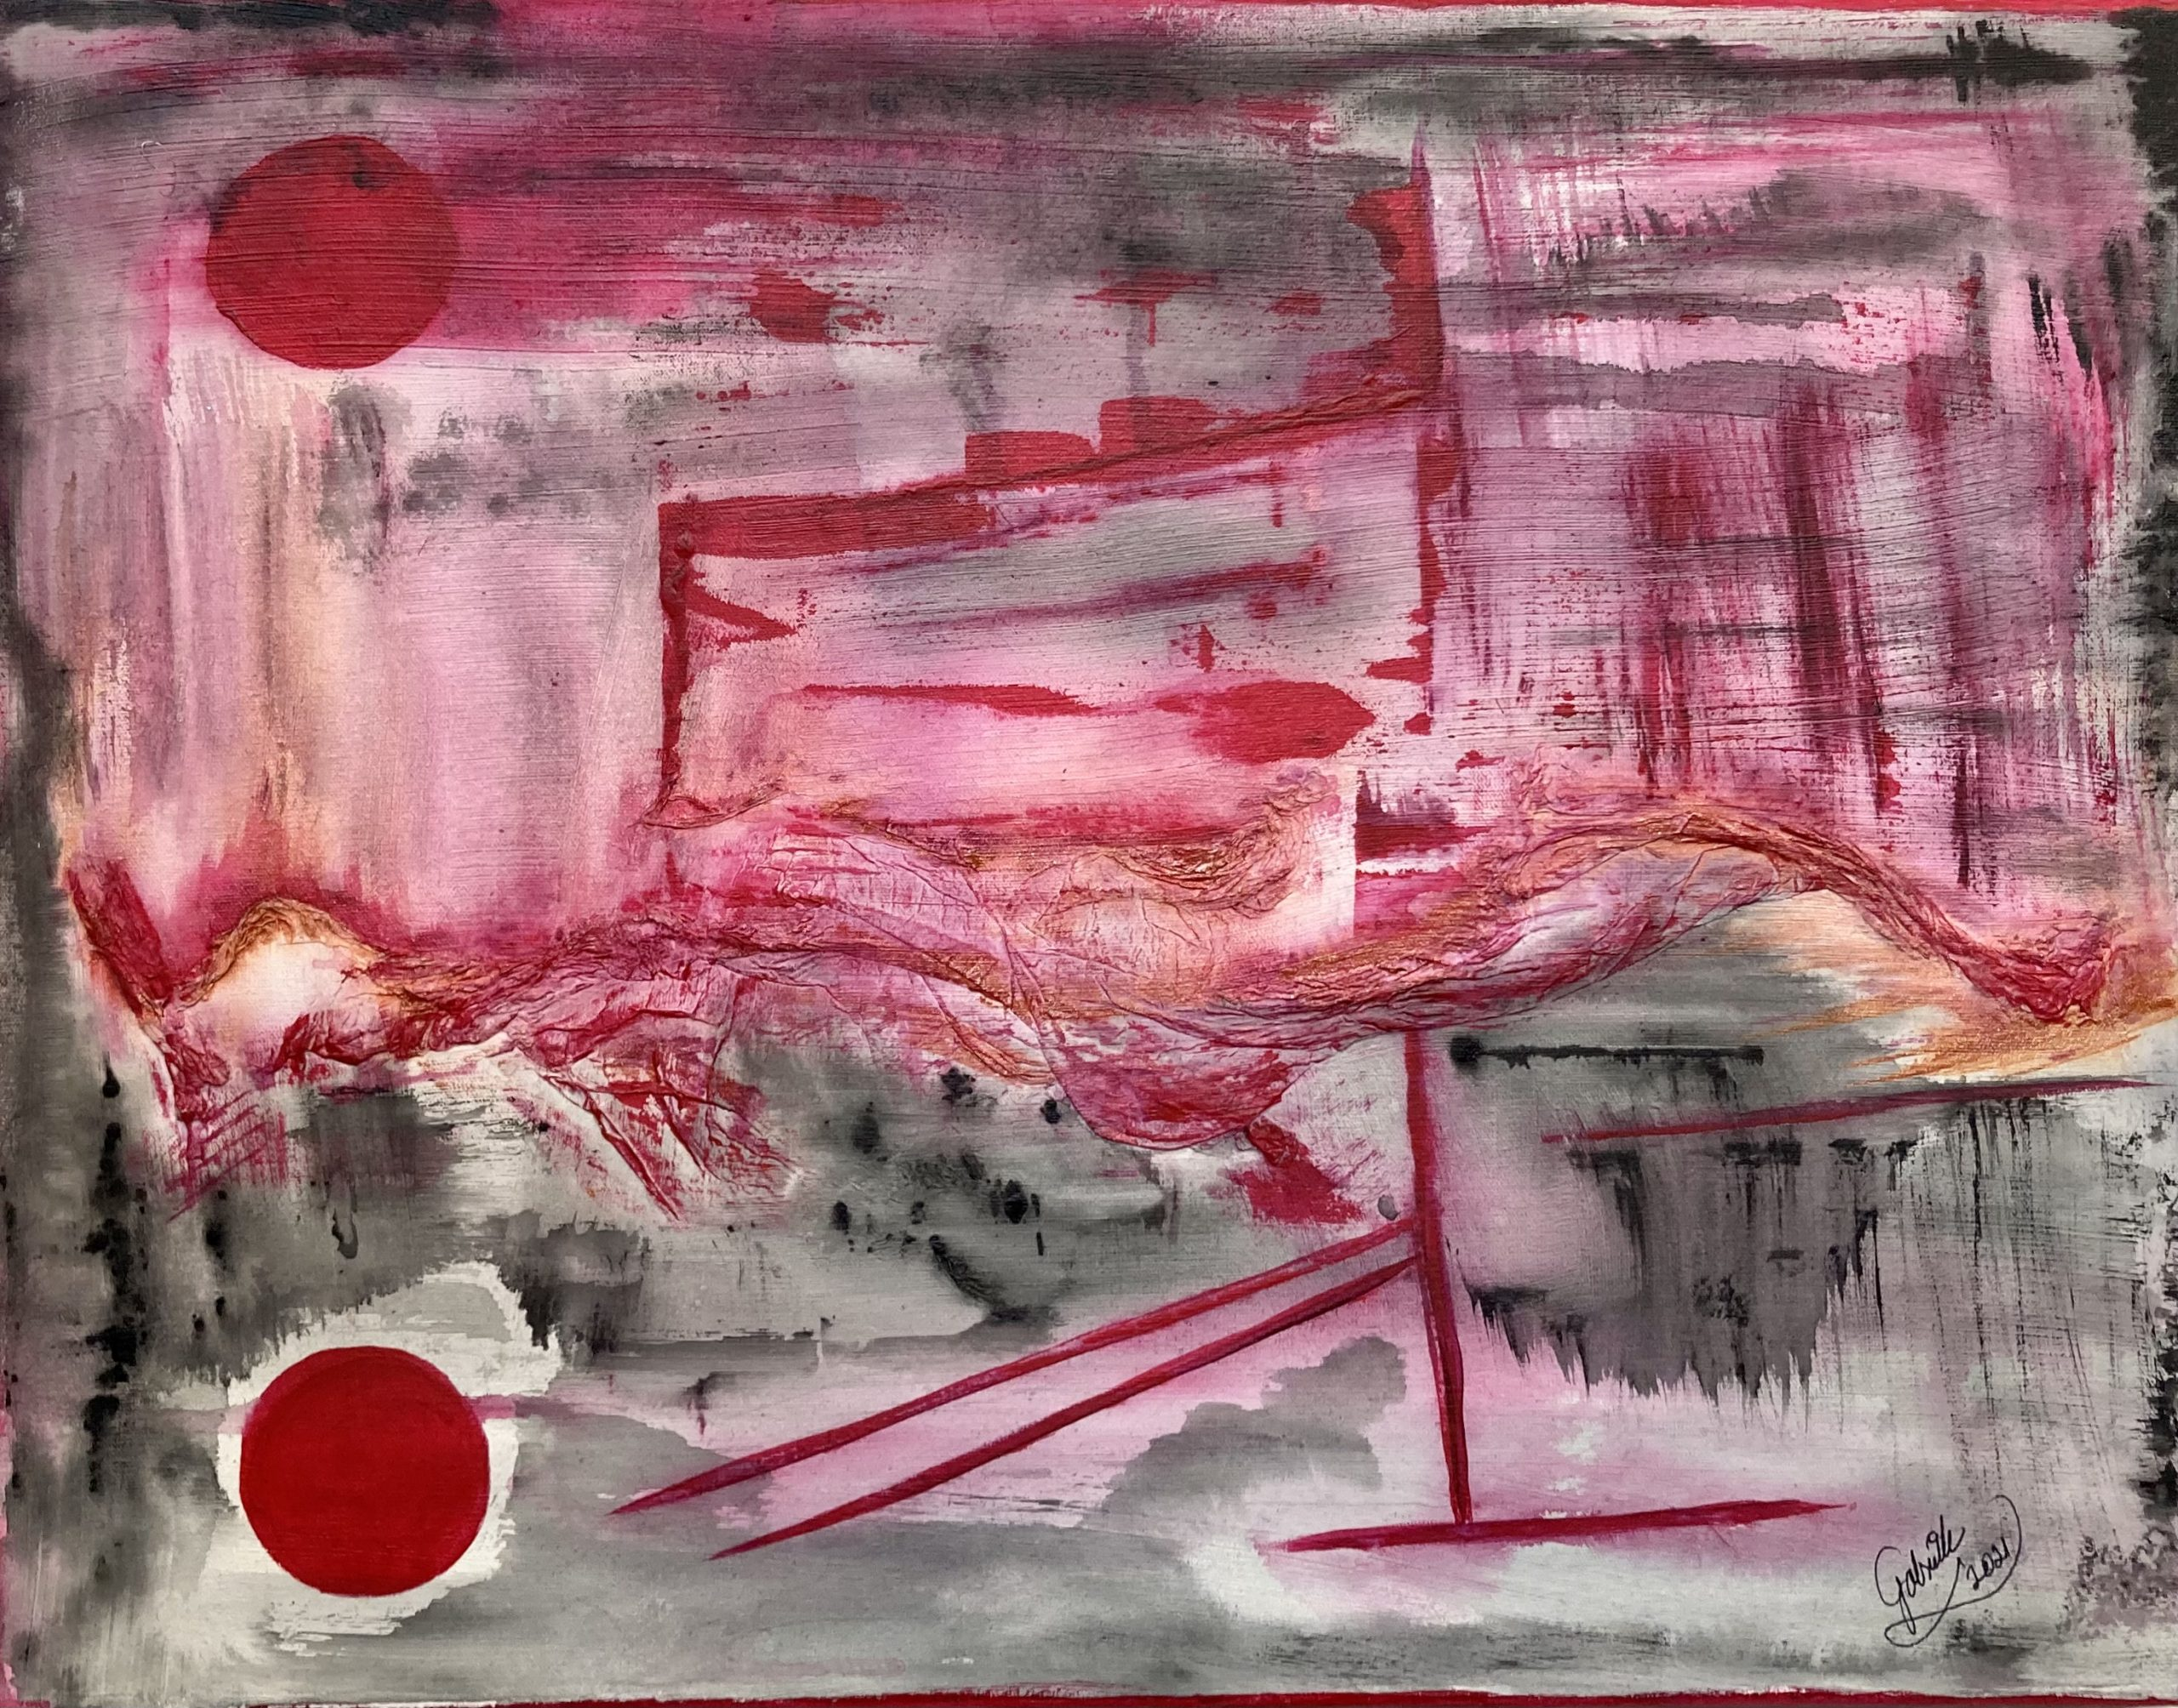 Red Moon - Gabrielle Toledo